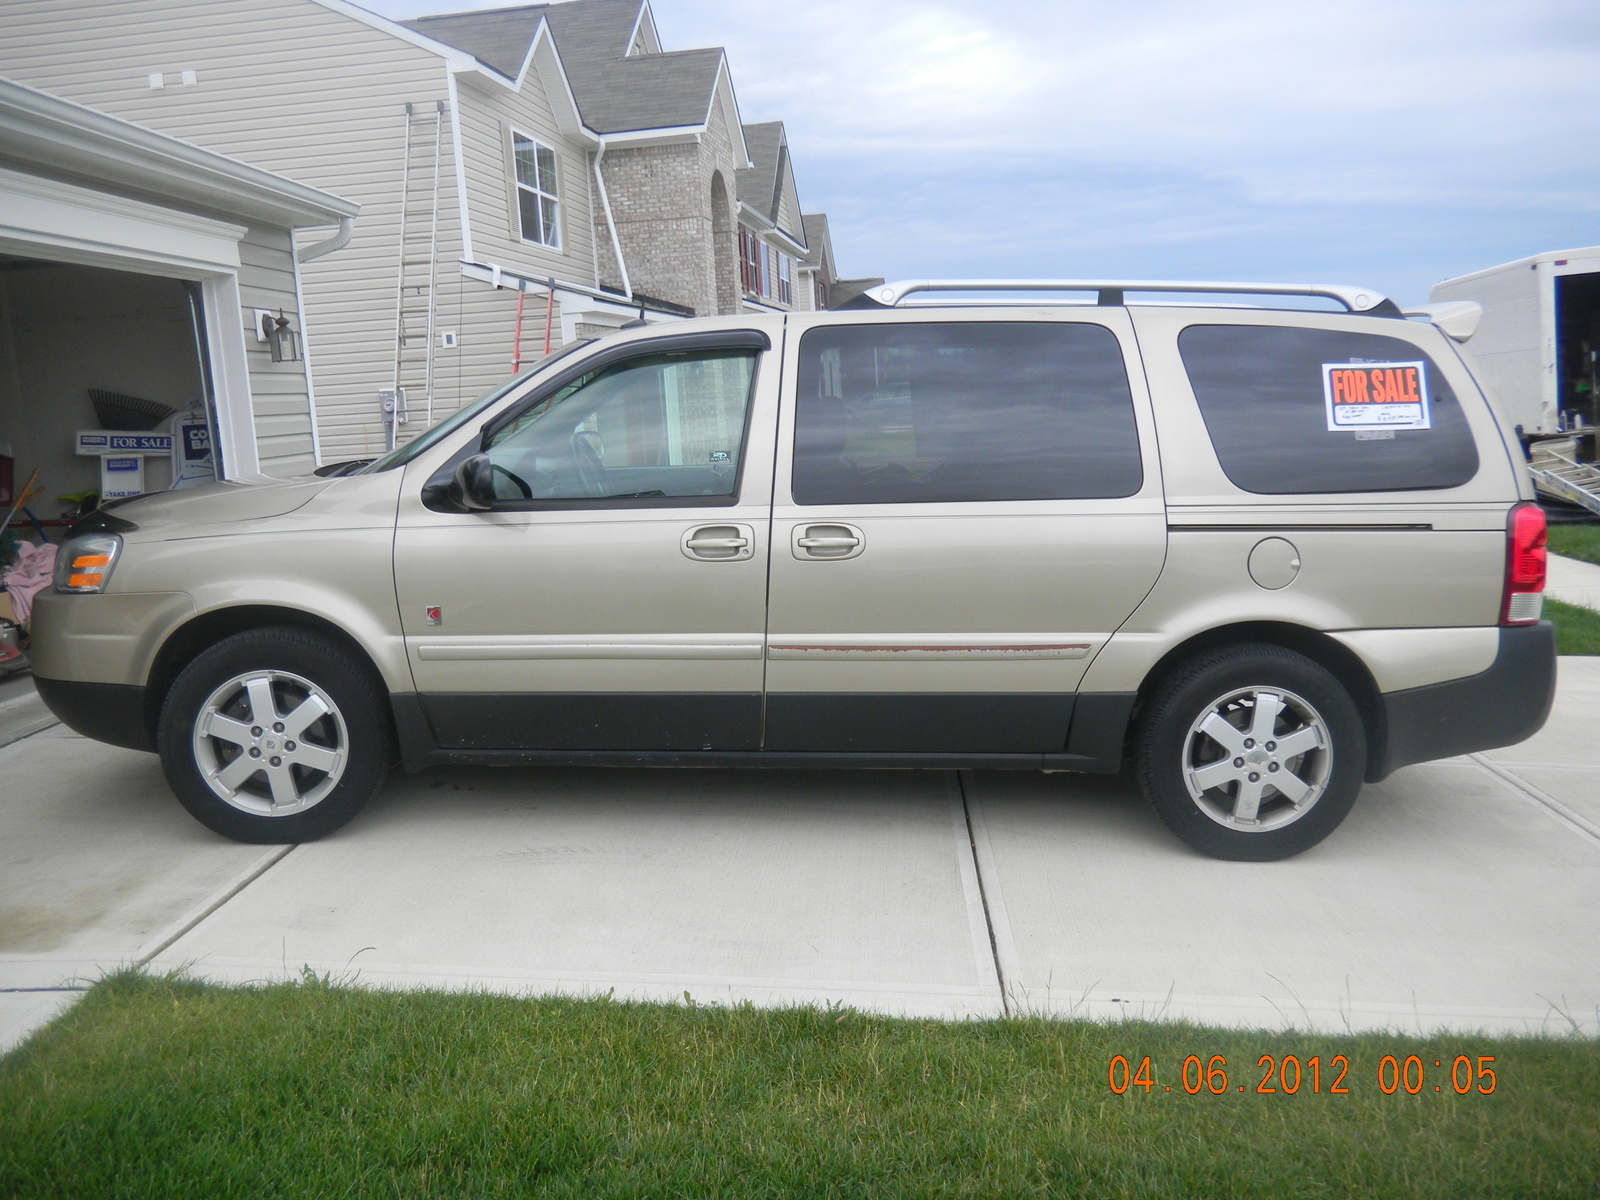 Picture of 2005 Saturn Relay 4 Dr 3 Passenger Van